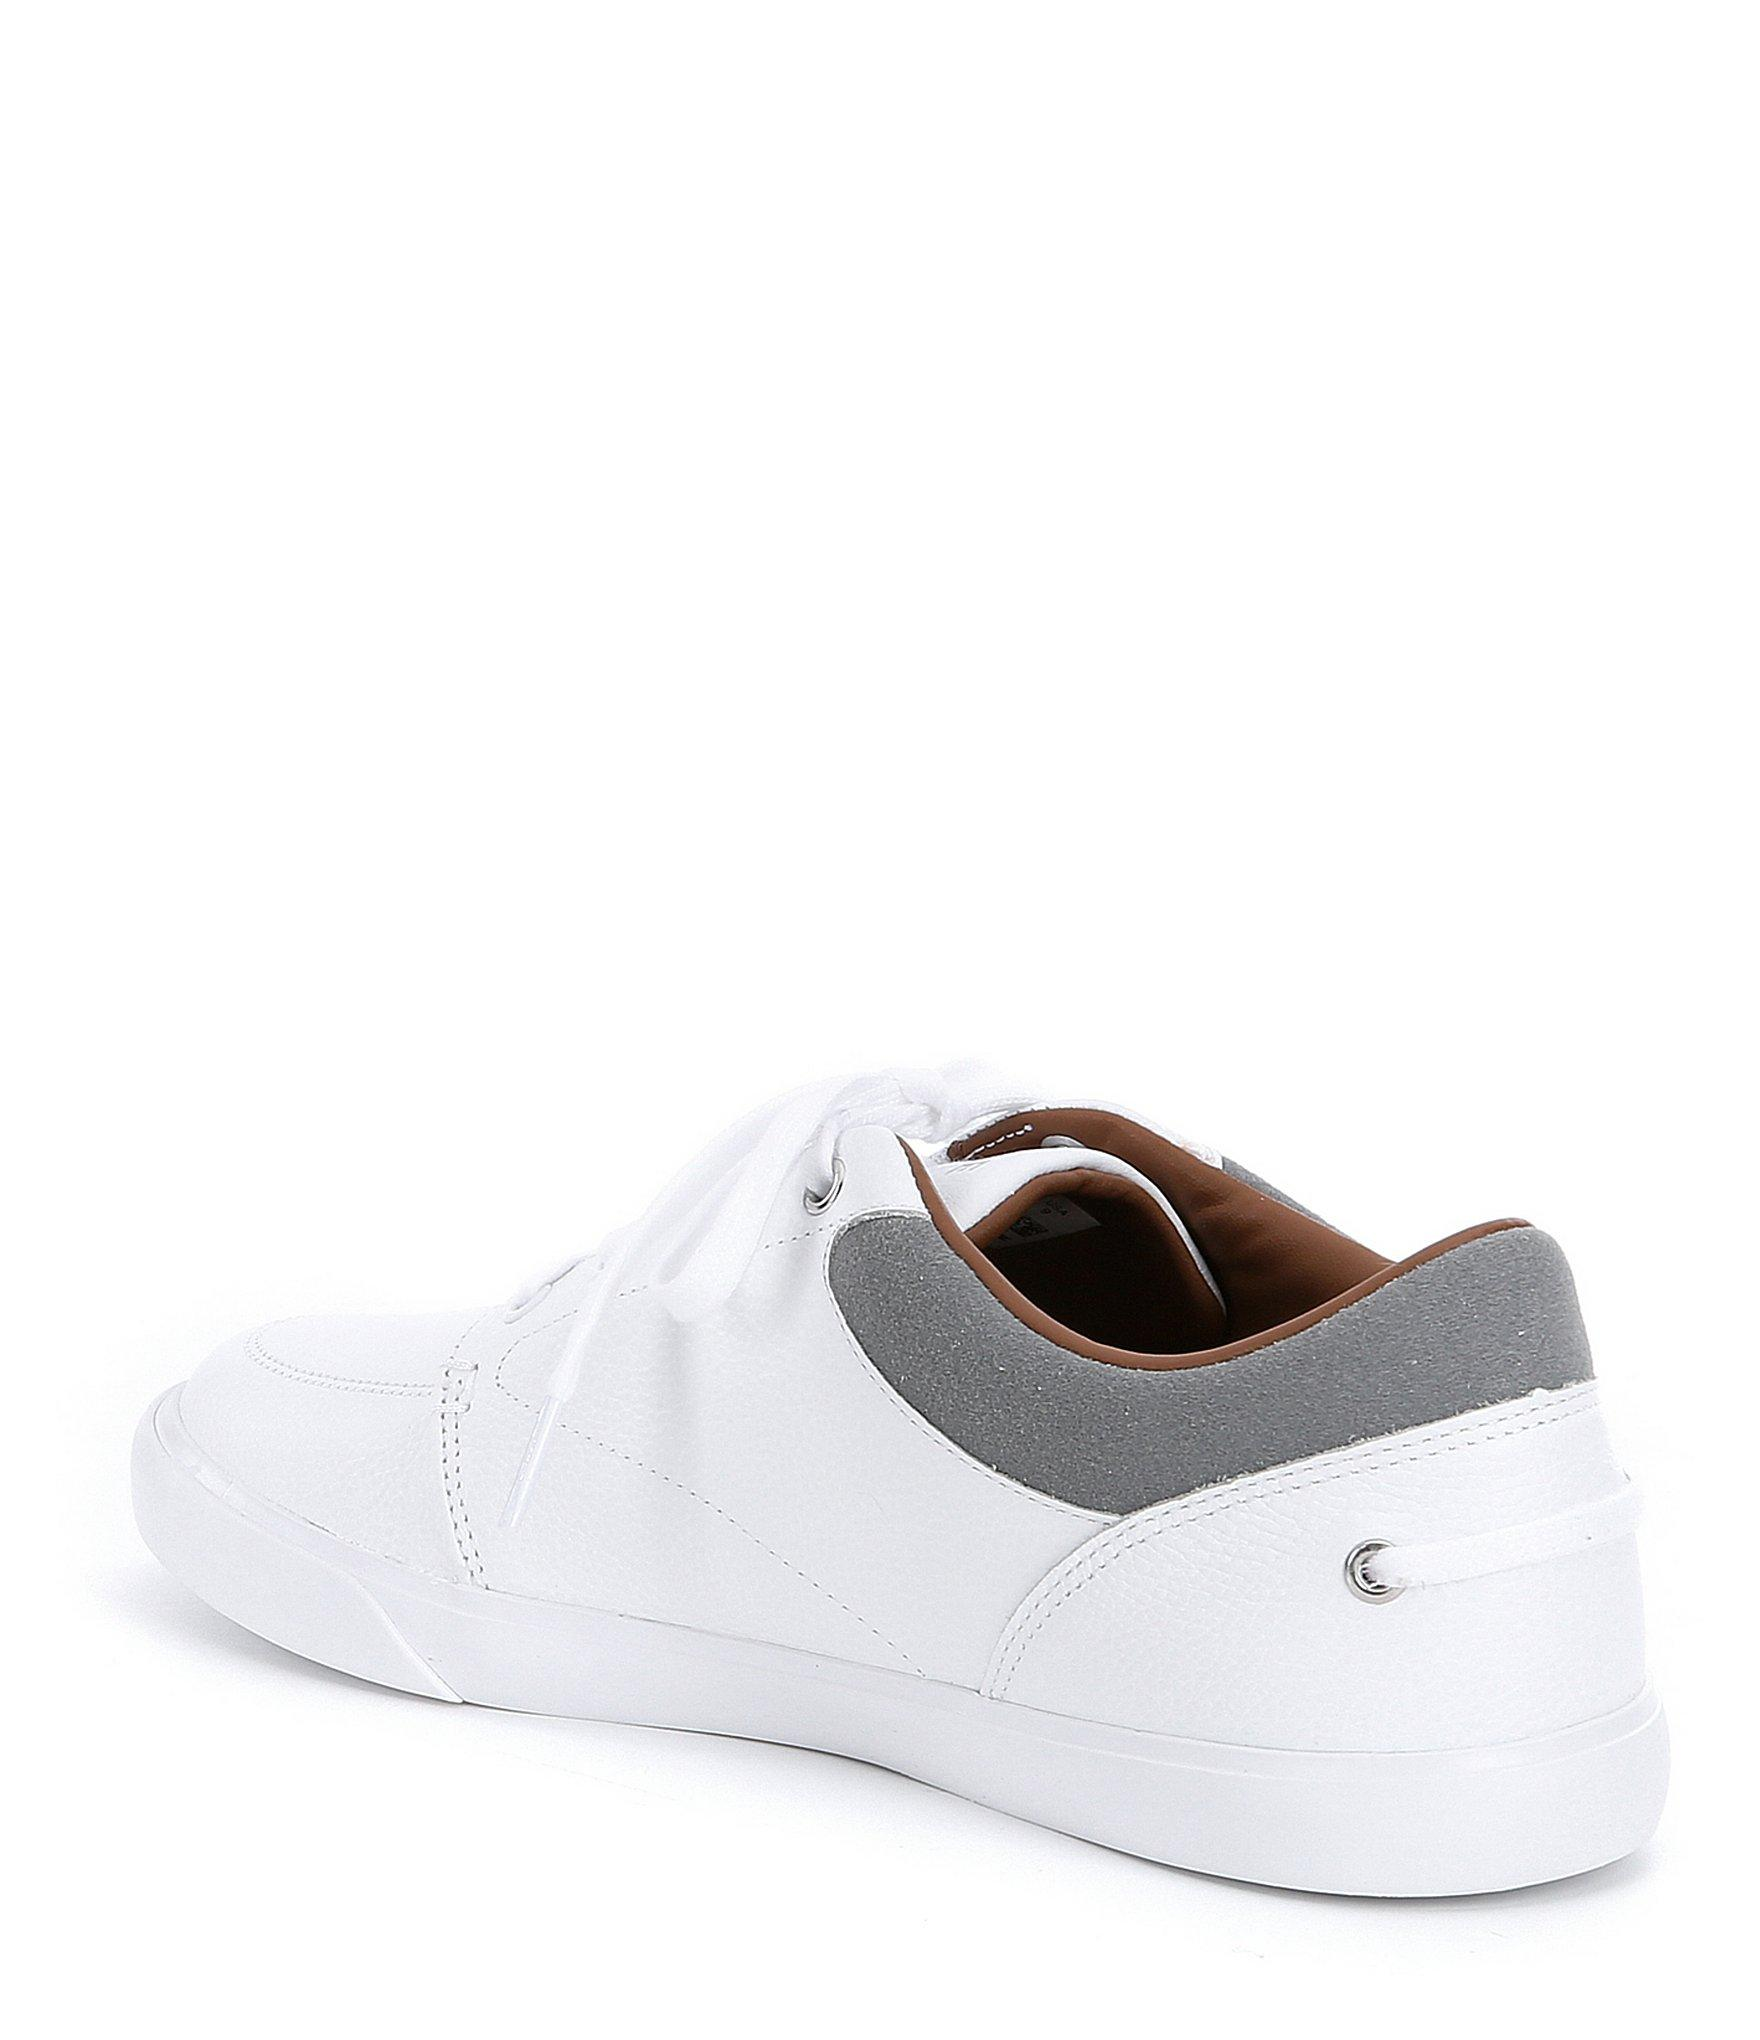 2fdf65904 Lacoste - Gray Men s Bayliss 118 Sneakers for Men - Lyst. View fullscreen